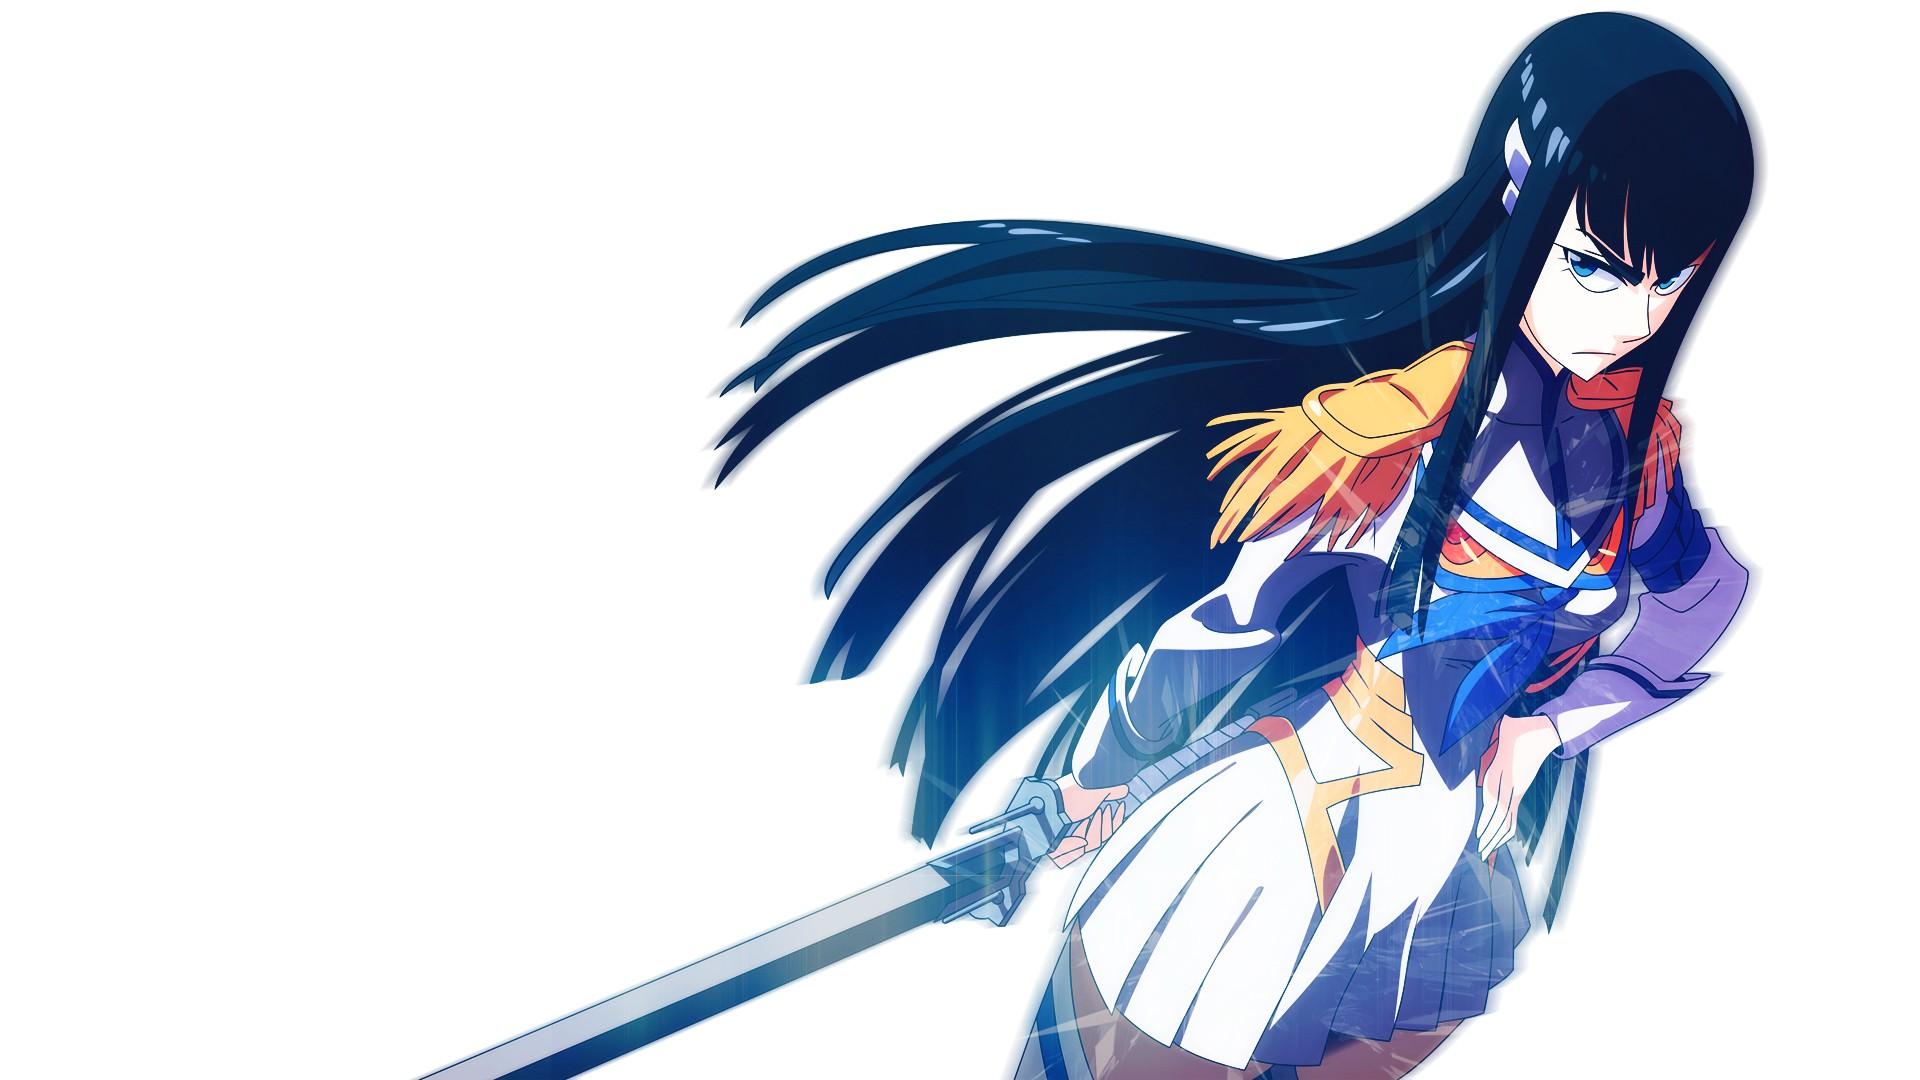 Wallpaper Illustration Anime Cartoon Kill La Kill Kiryuin